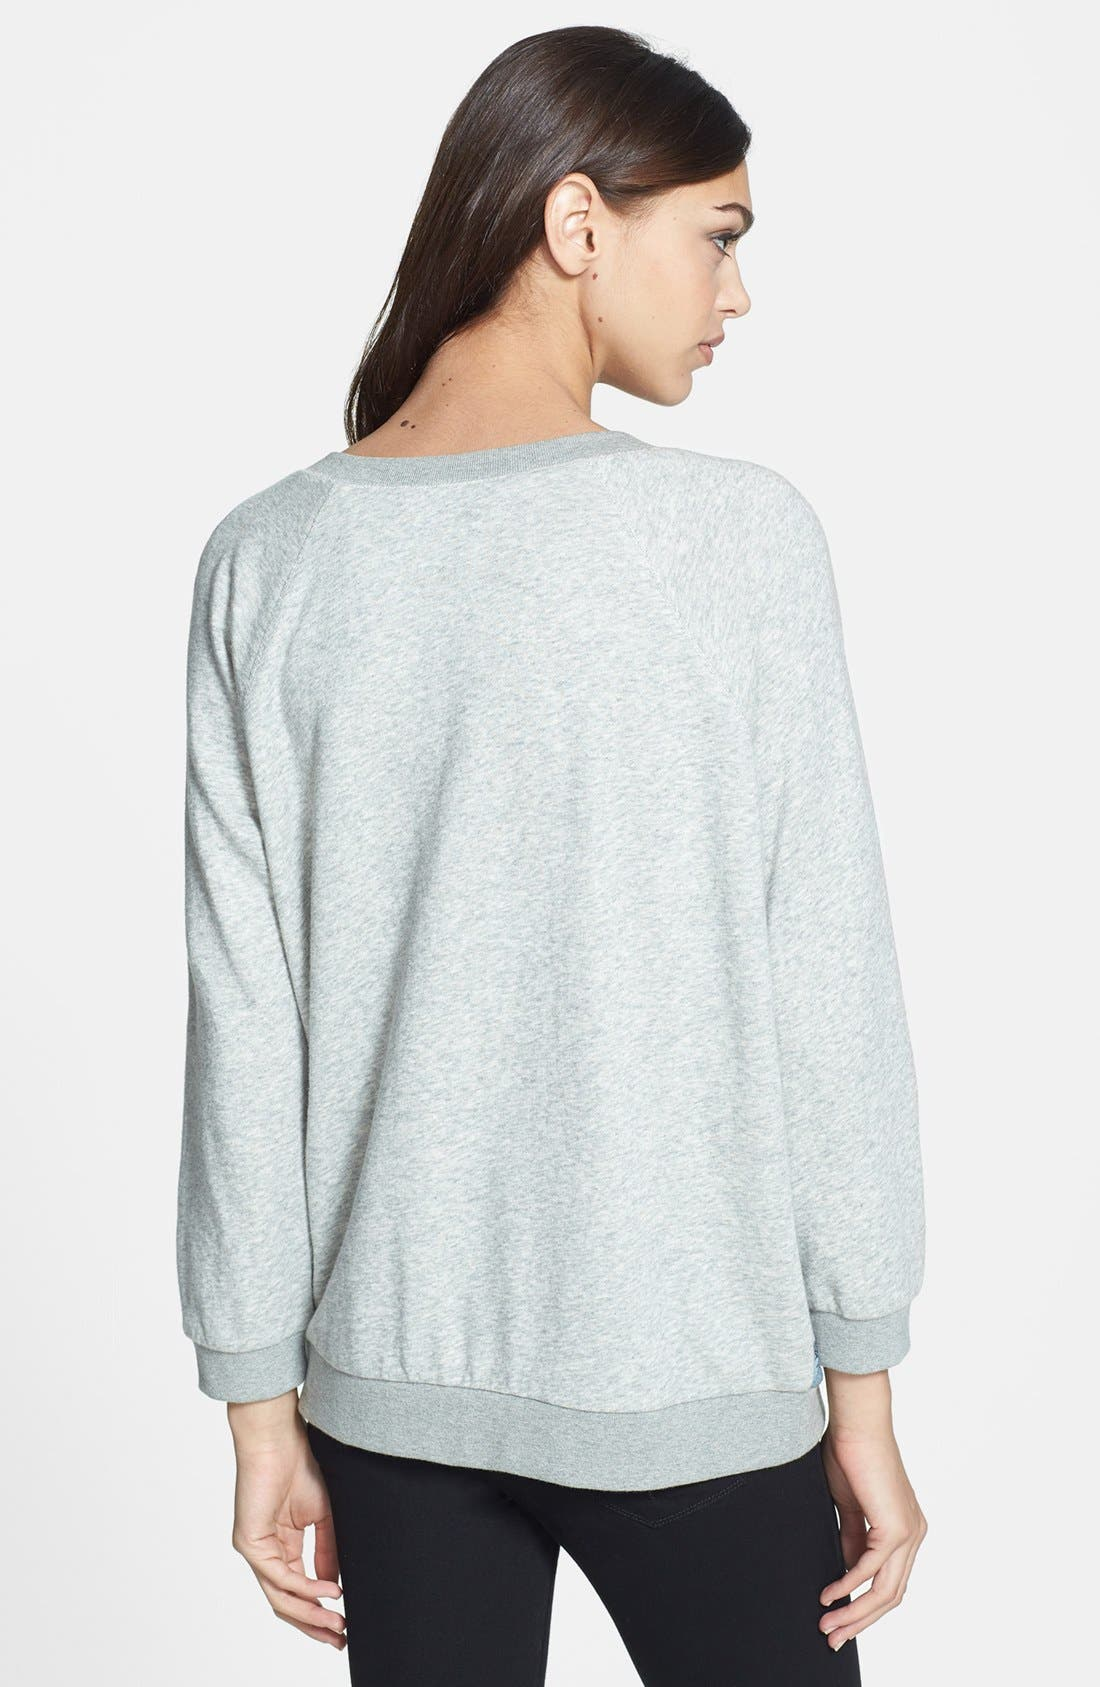 Alternate Image 2  - MARC BY MARC JACOBS 'Lena' Print Cotton Sweatshirt